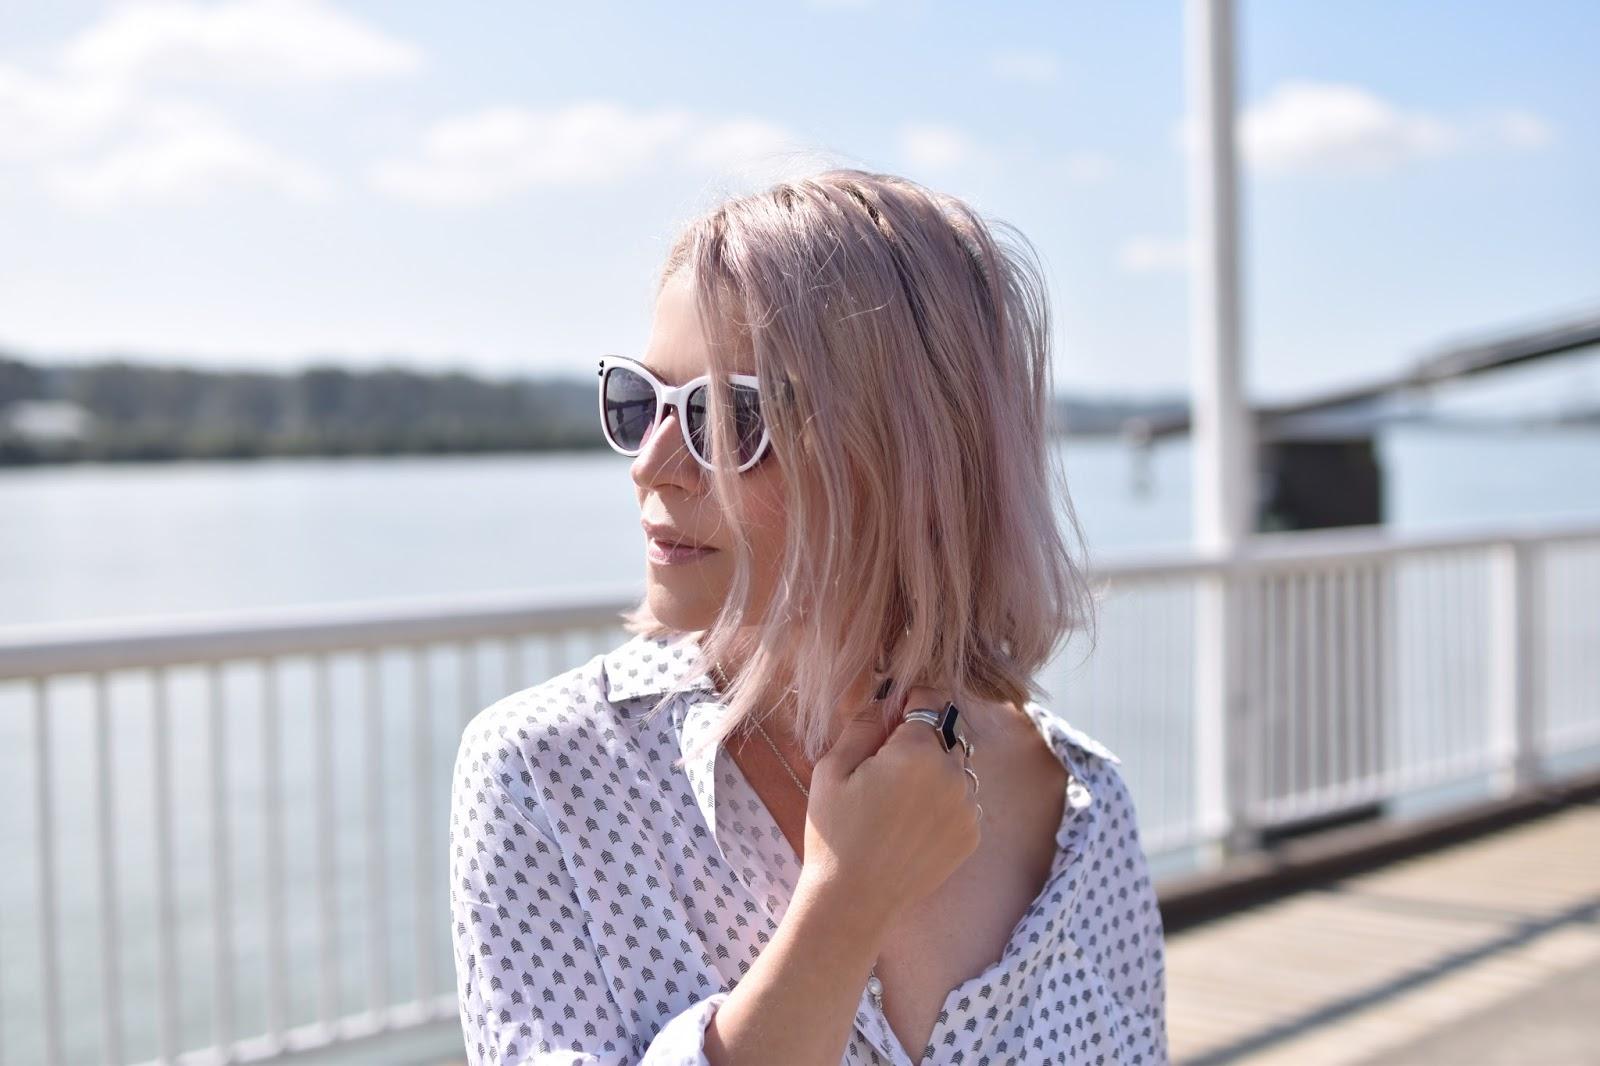 Monika Faulkner outfit inspiration - white patterned shirt, white sunglasses